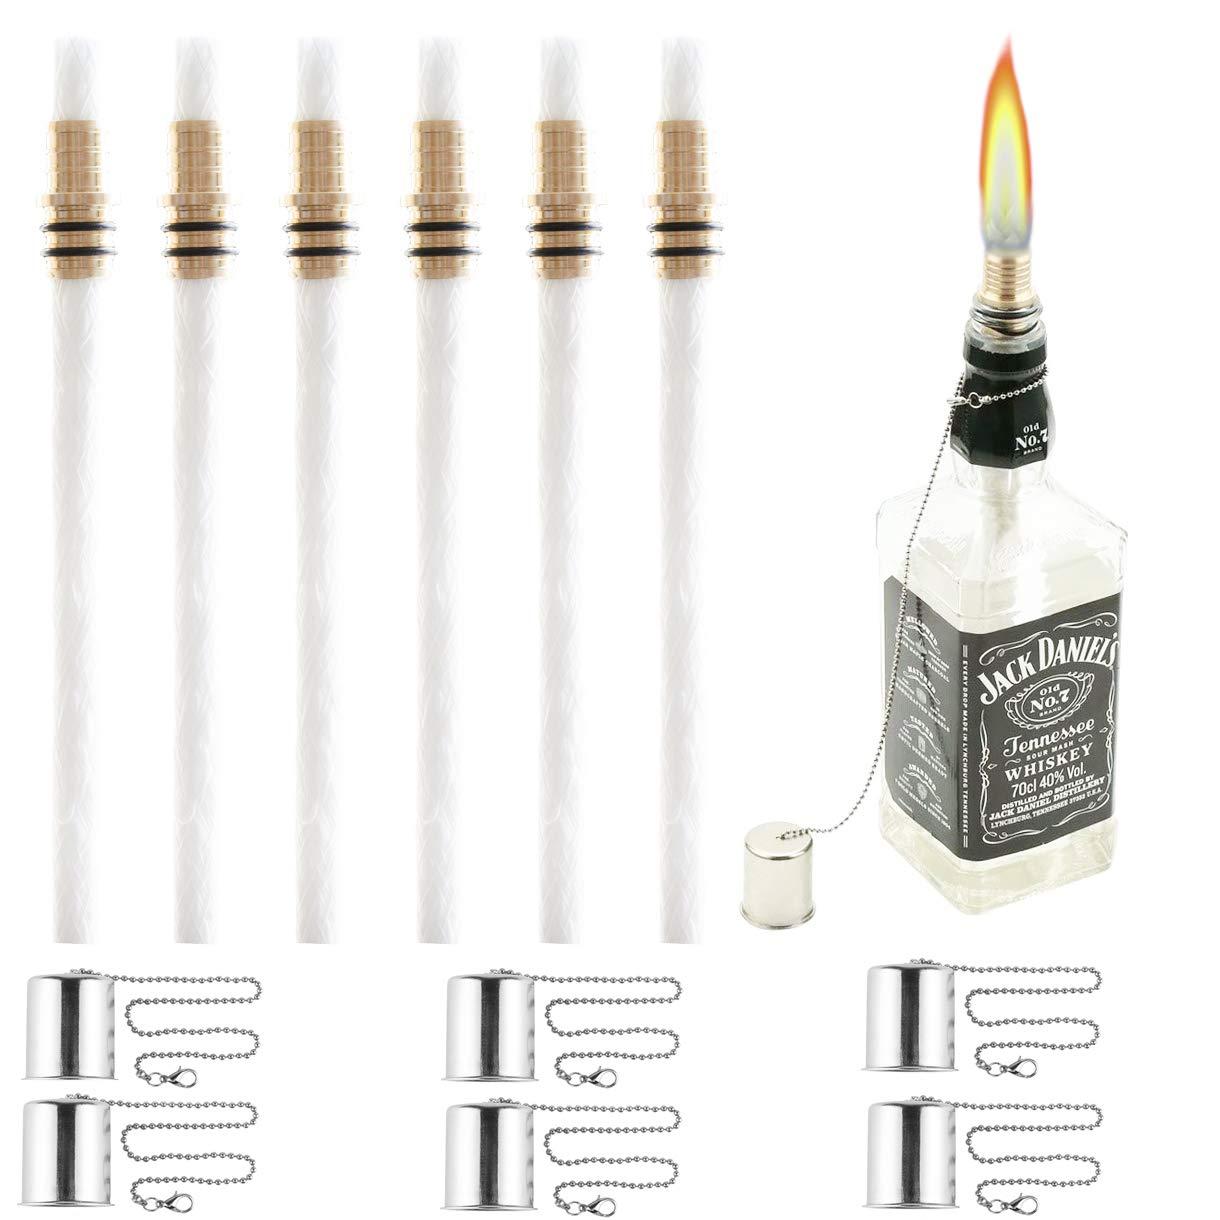 OEXEO Tiki Torch Kit,Torch Wicks and Brass Wick Mount, Table Top Torch Lantern Kit (6PCS)